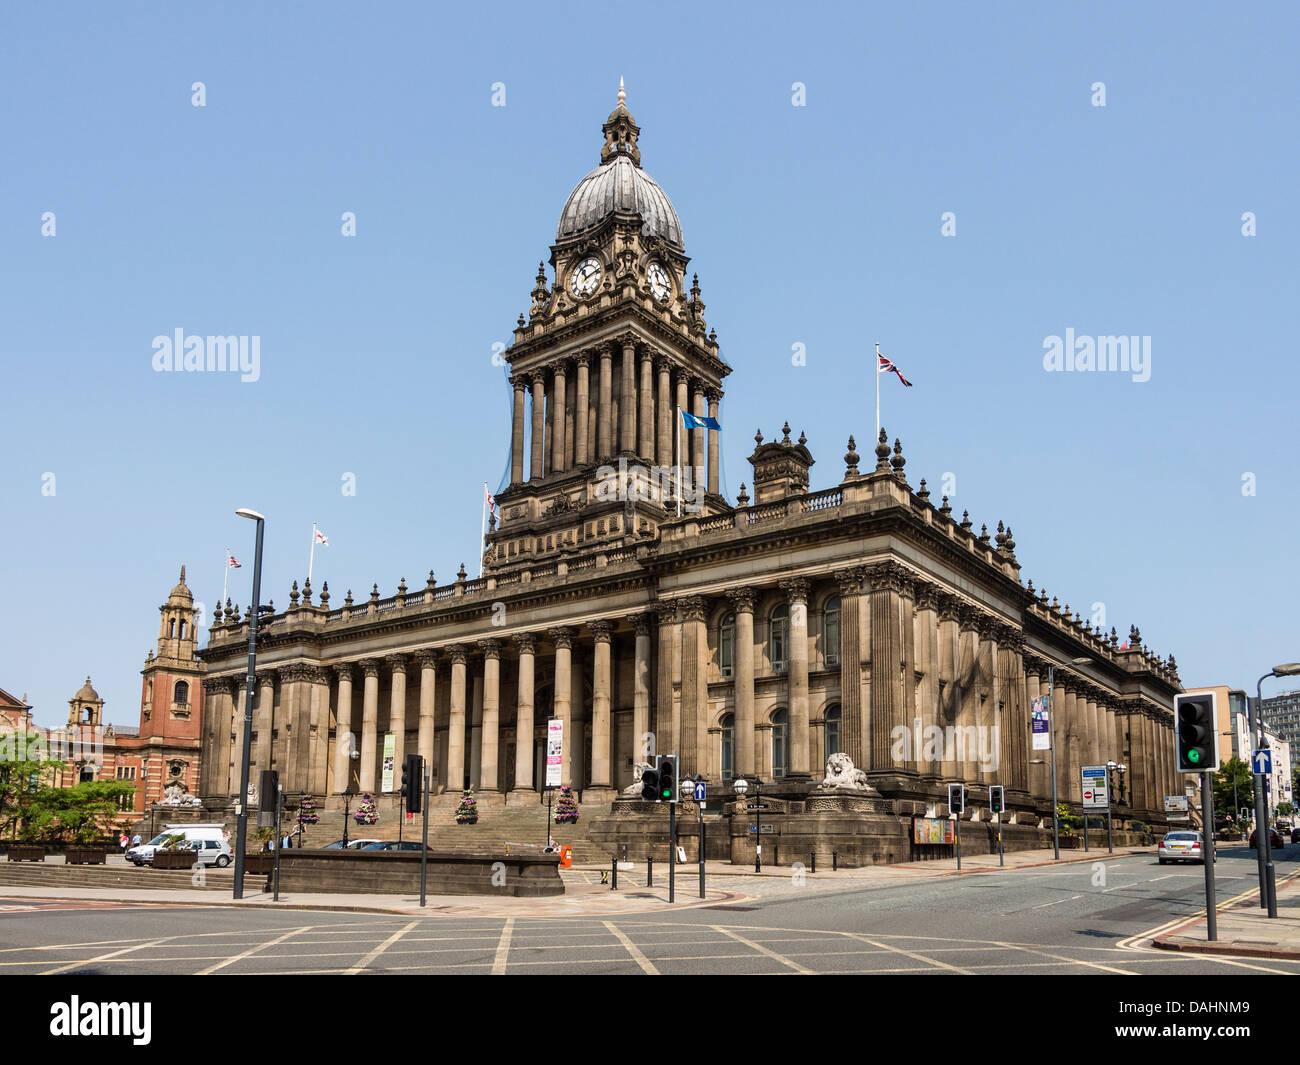 Town Hall Leeds Yorkshire UK - Stock Image